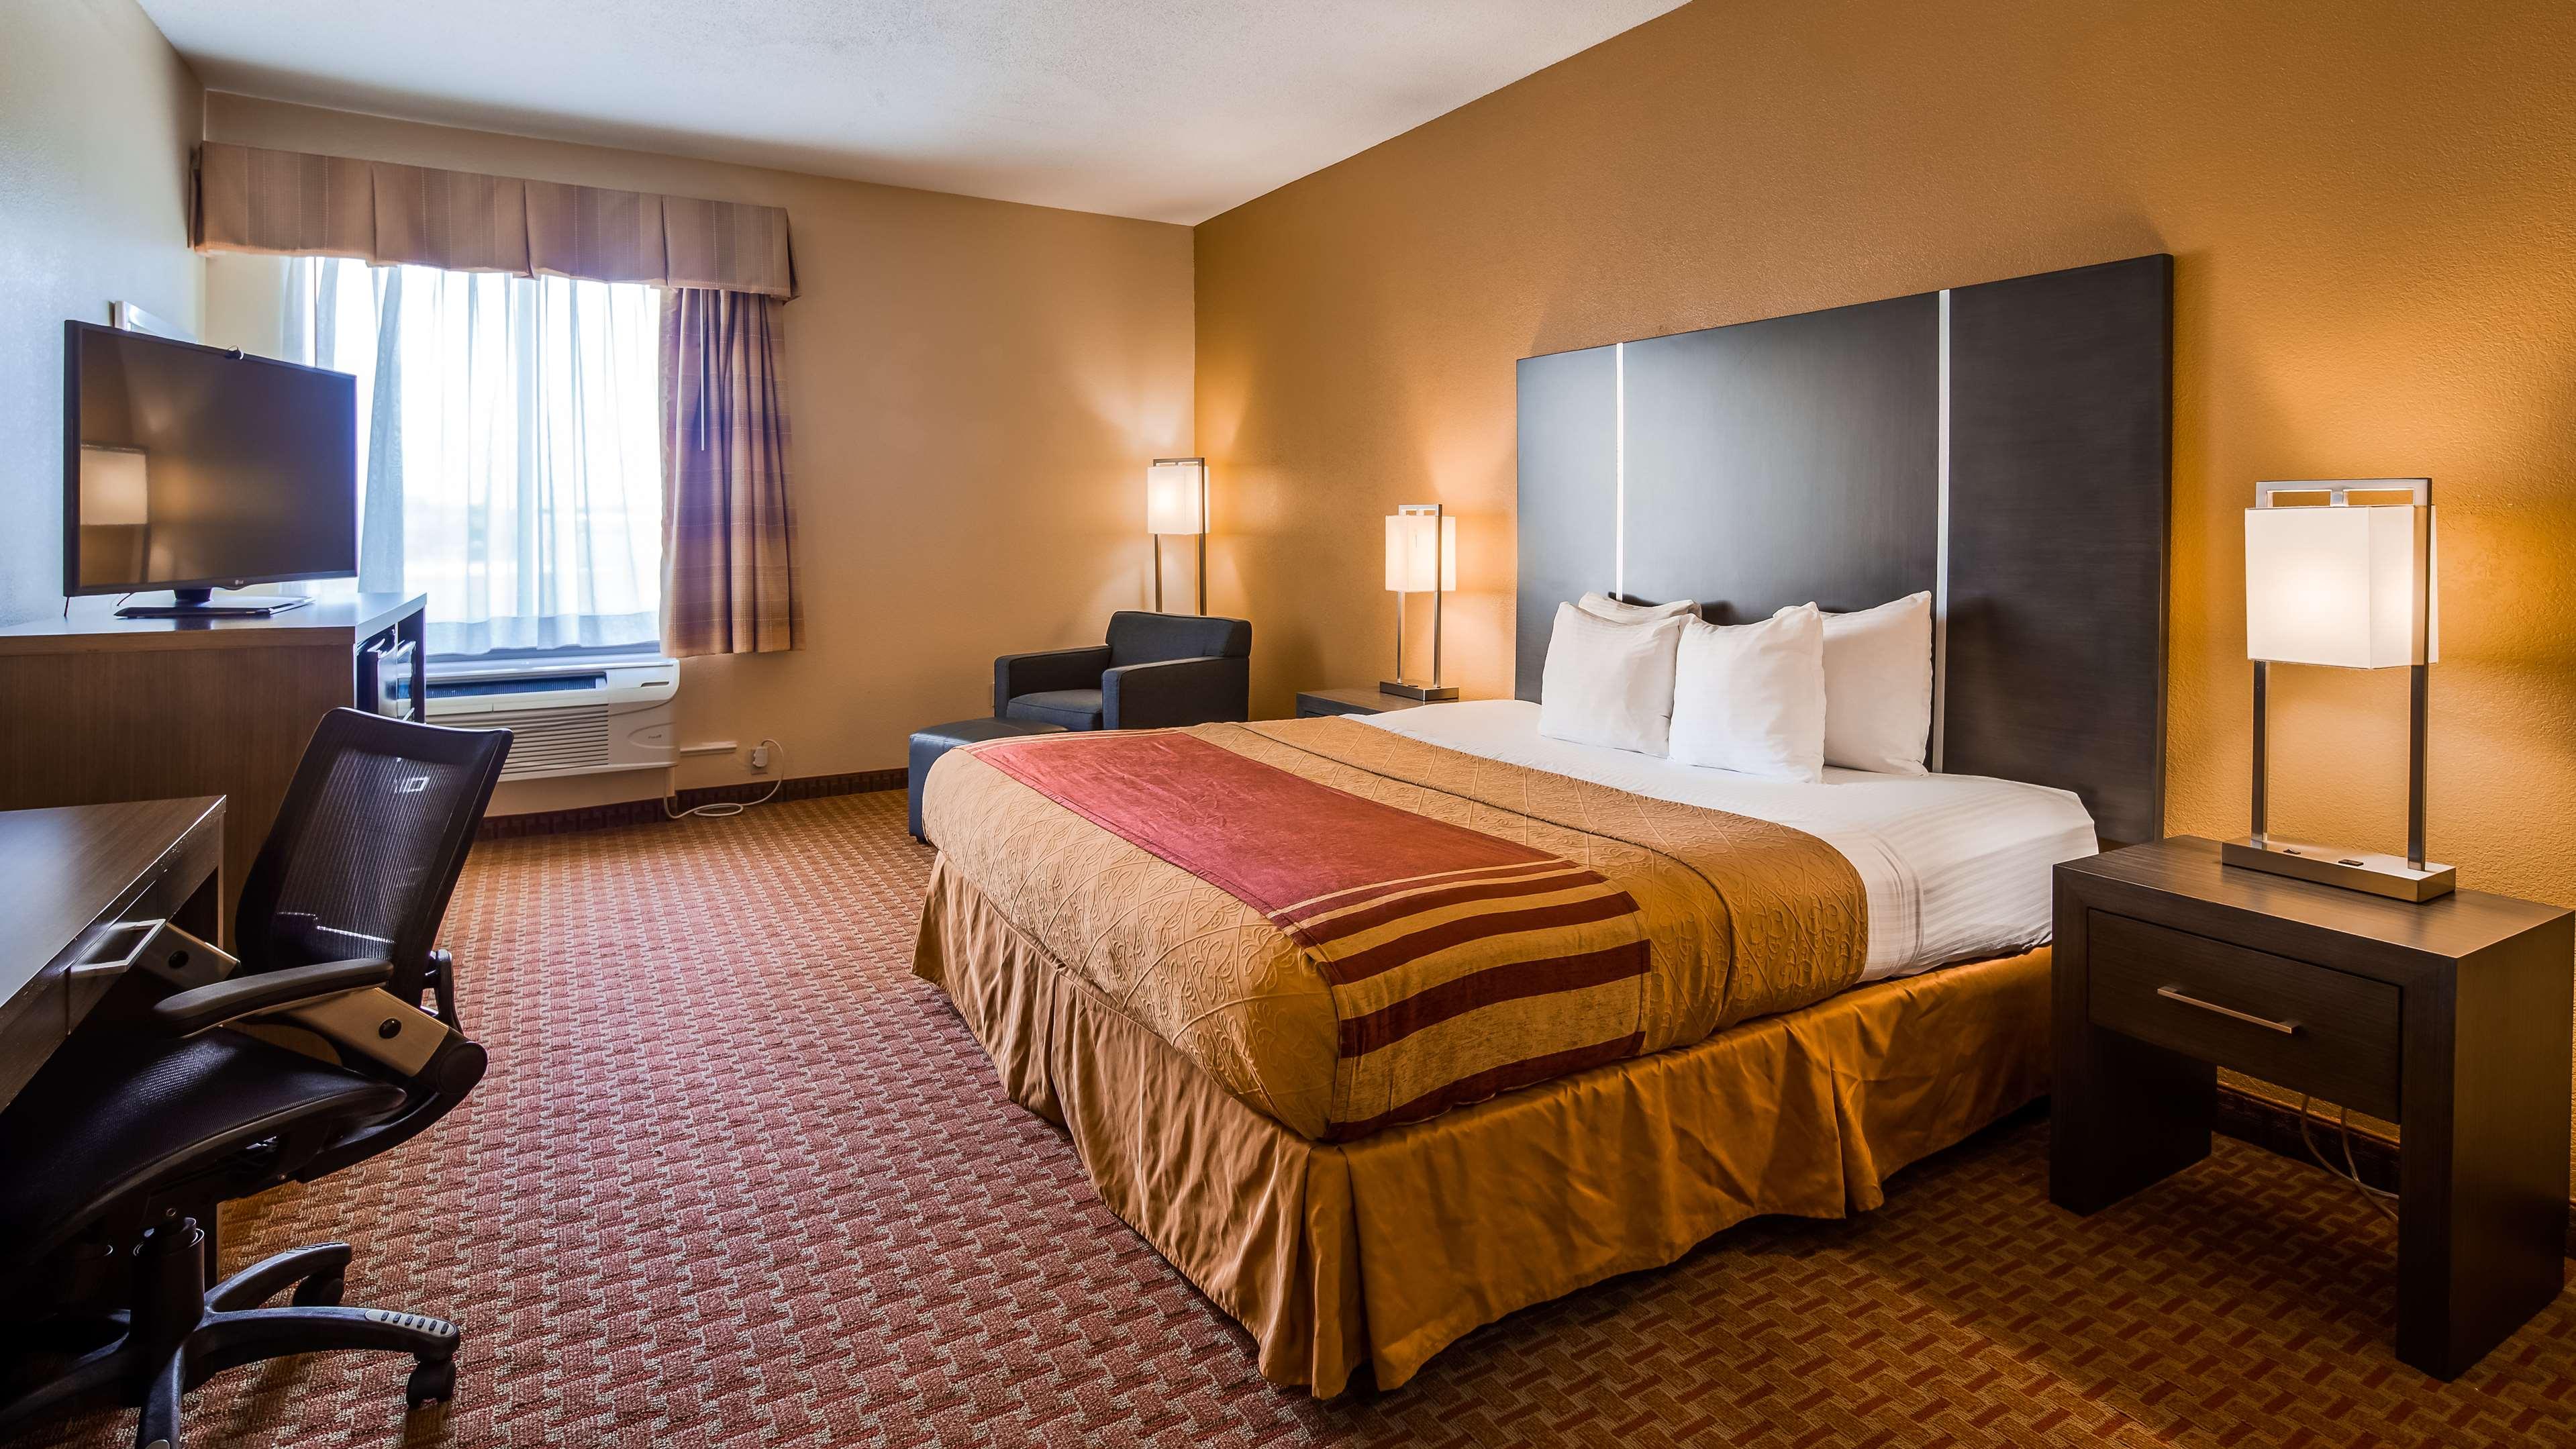 Best Western Plus North Houston Inn & Suites image 13